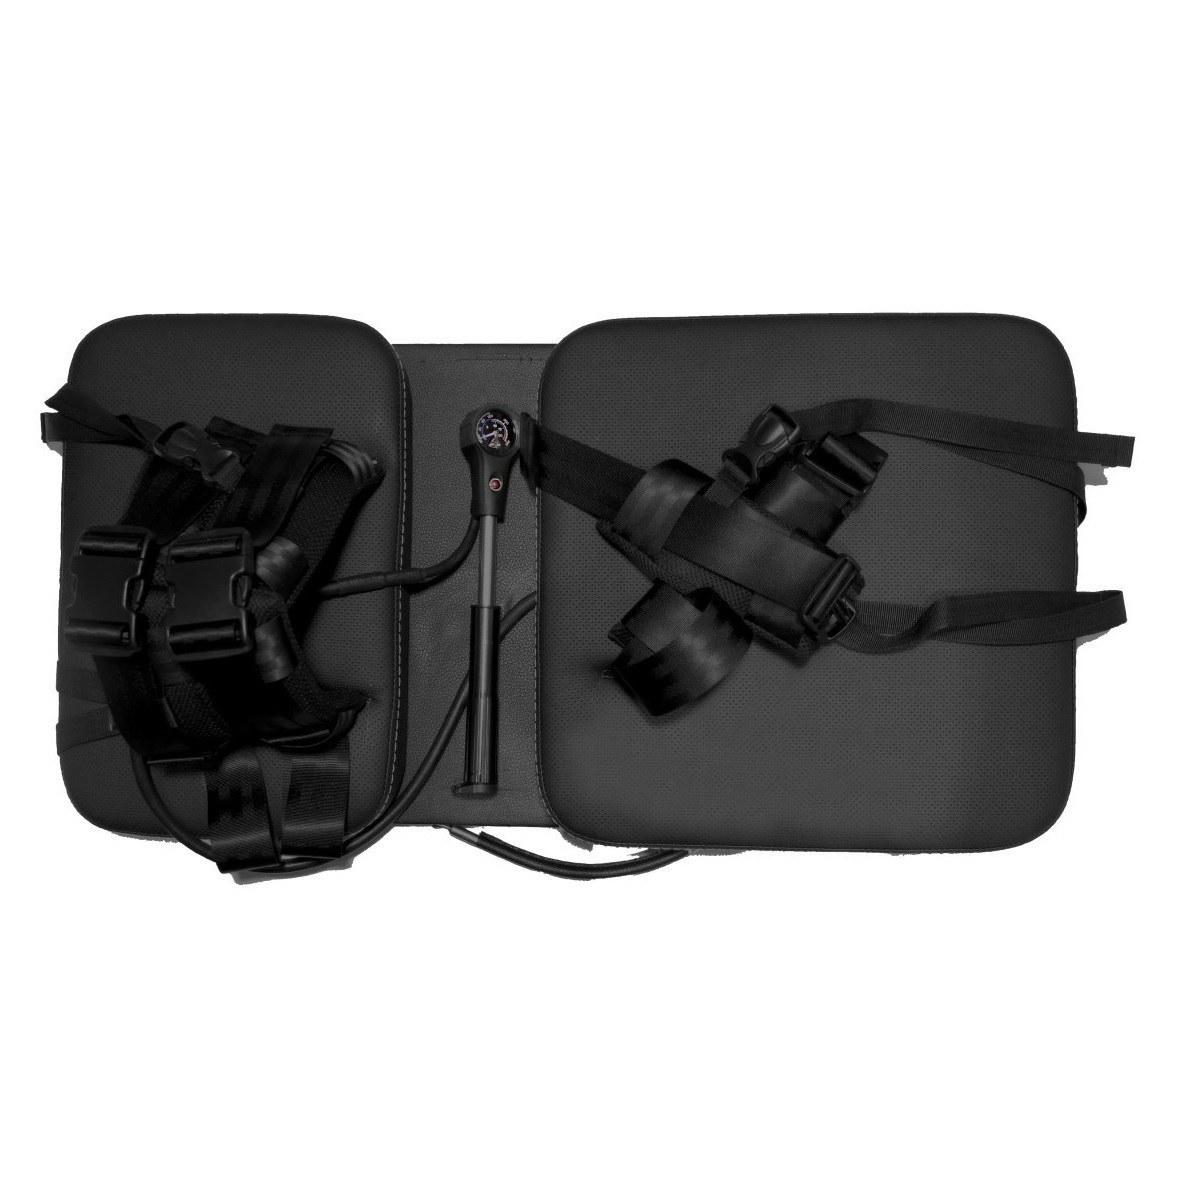 تصویر دستگاه دیسک کمر مدل L5                             L5 Lumbar Traction Unit